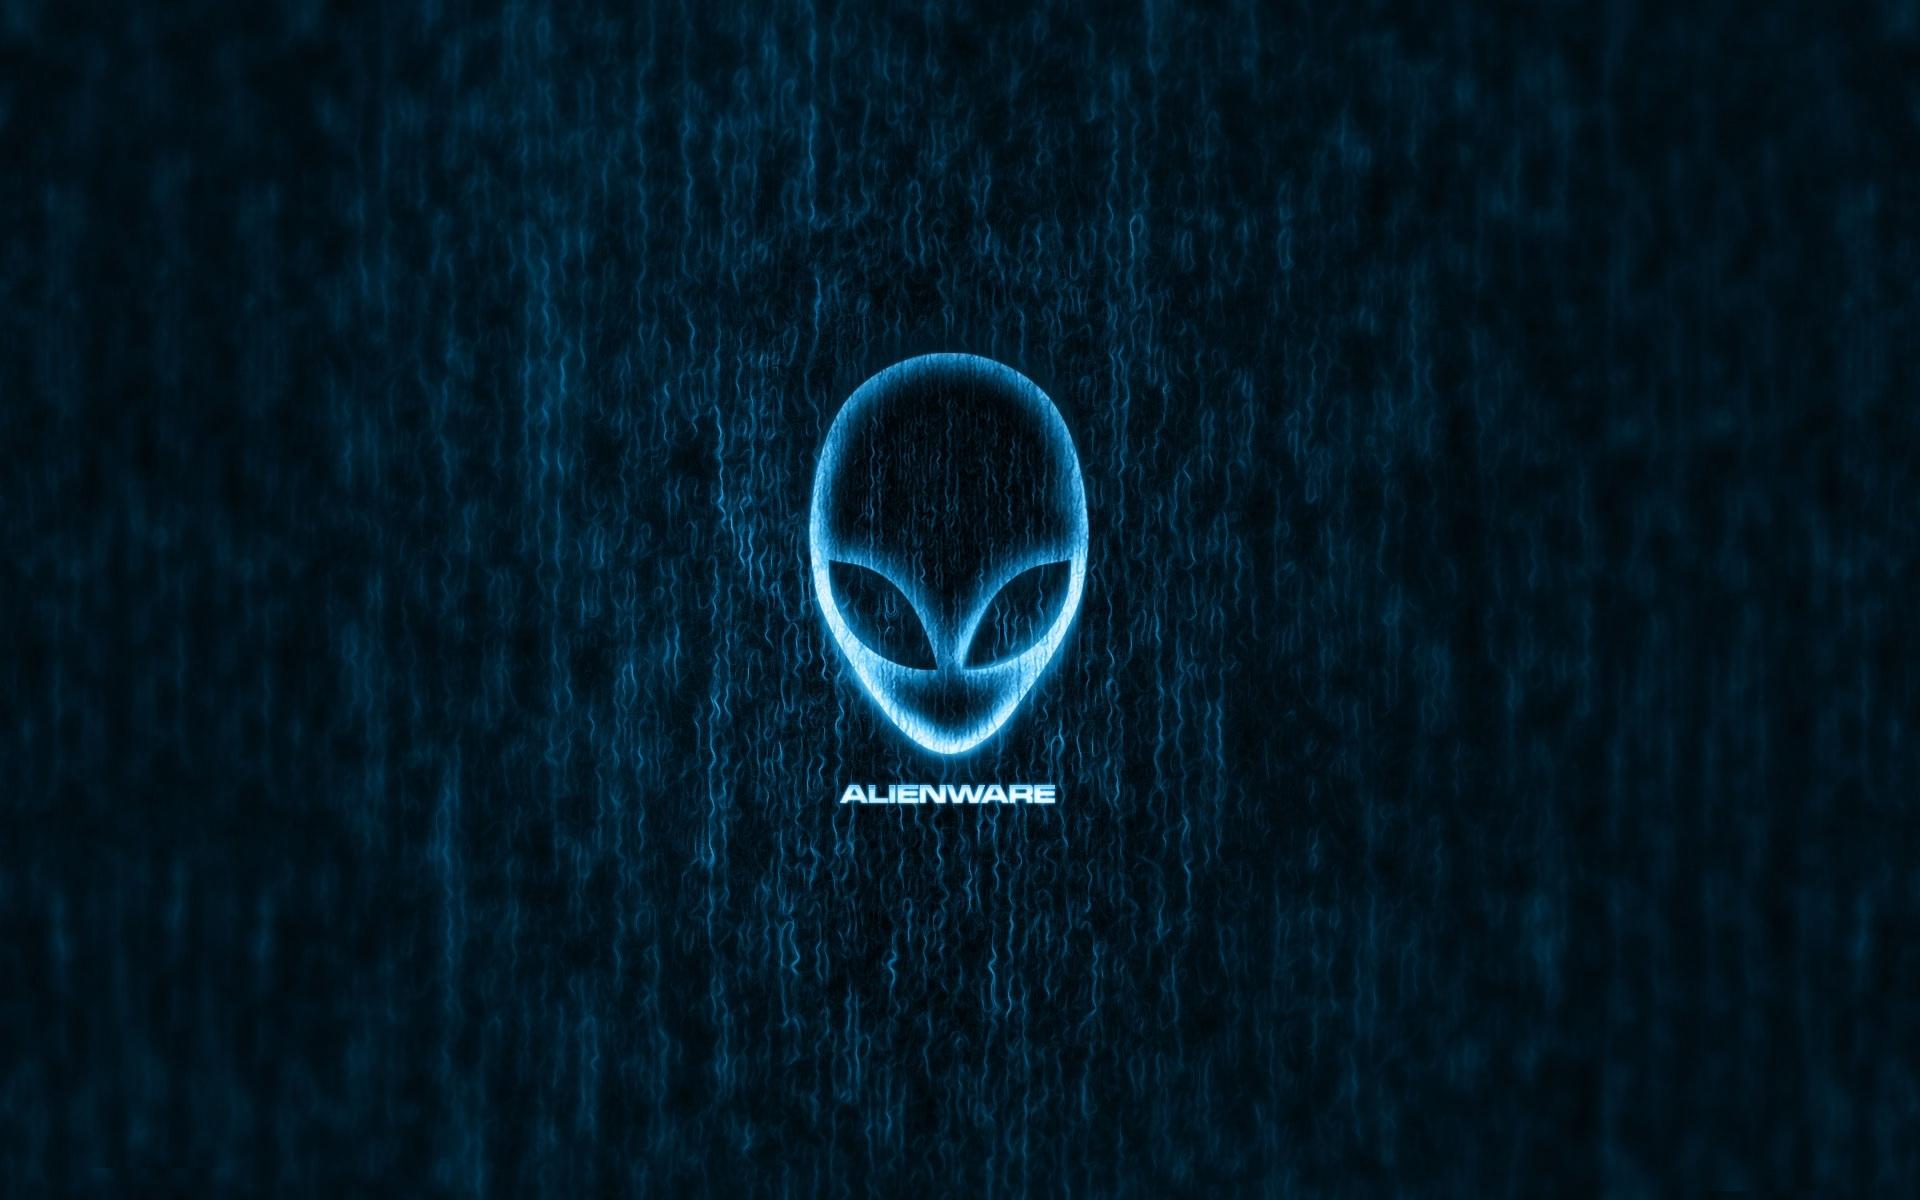 alienware, инопланетянин, компания